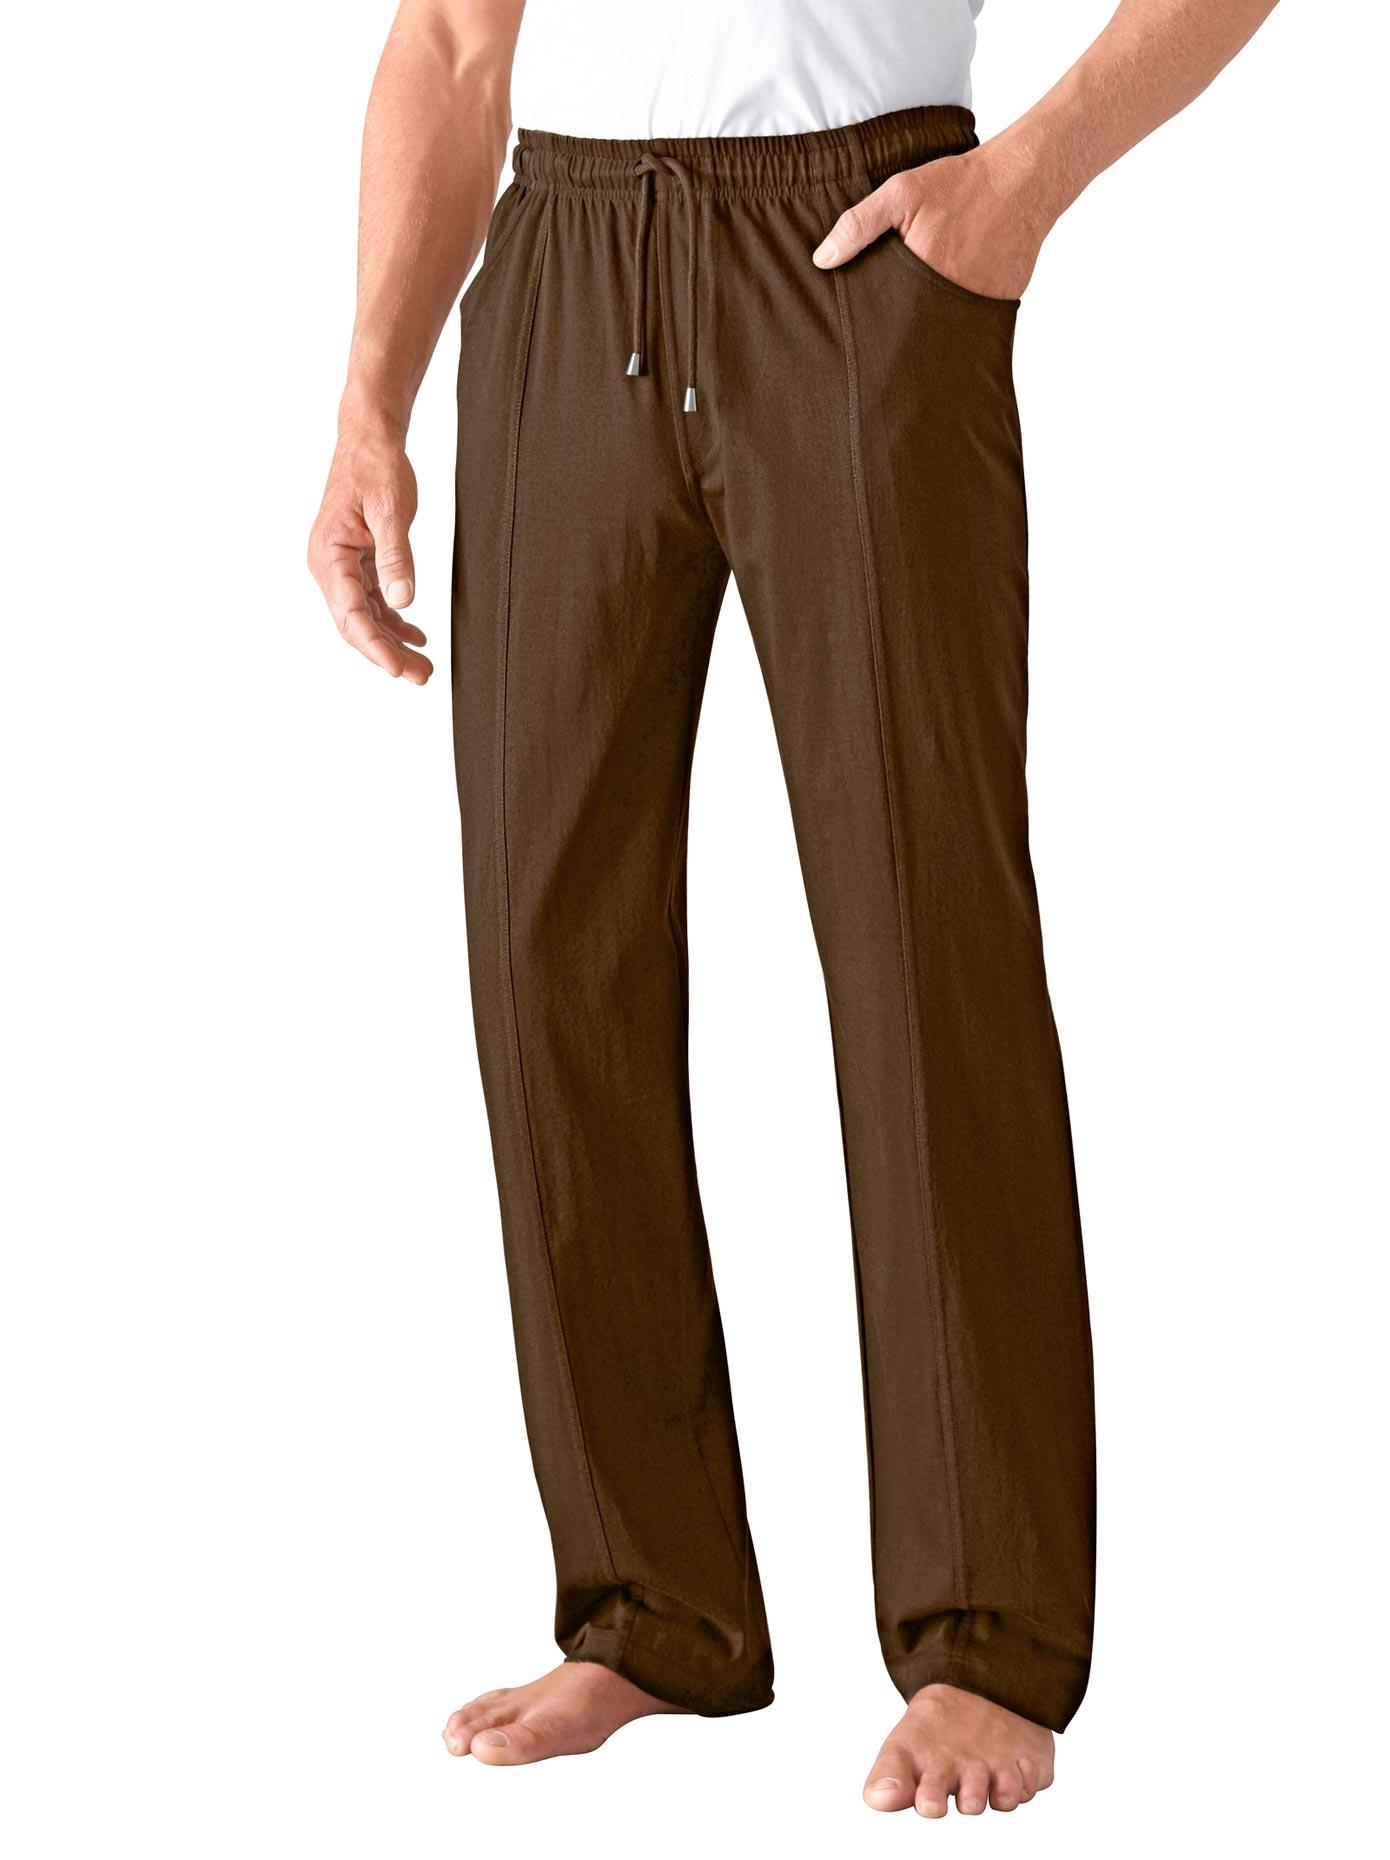 Classic Freizeithose mit streckenden Teilungsnähte | Sportbekleidung > Sporthosen > Sonstige Sporthosen | Classic